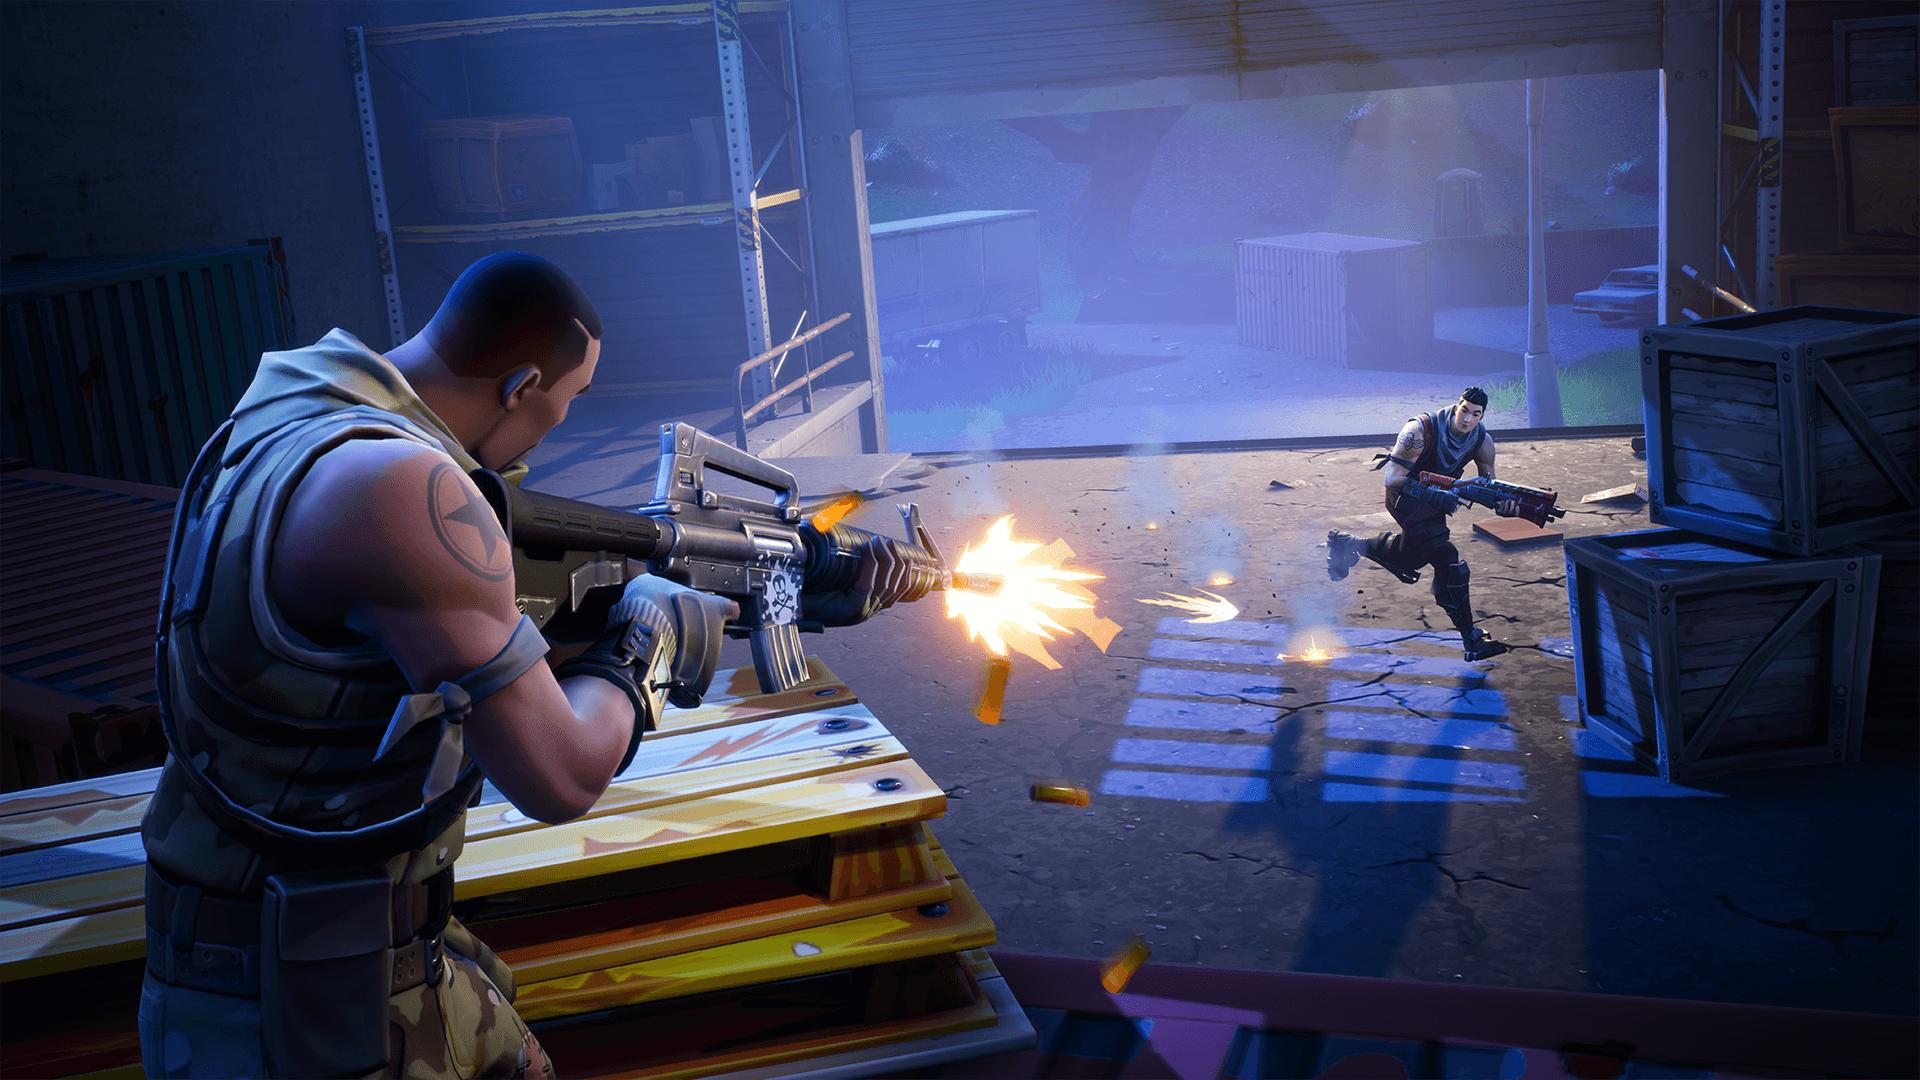 Fortnite Wallpaper Battle Royale Combat Fight Jeux Video Info